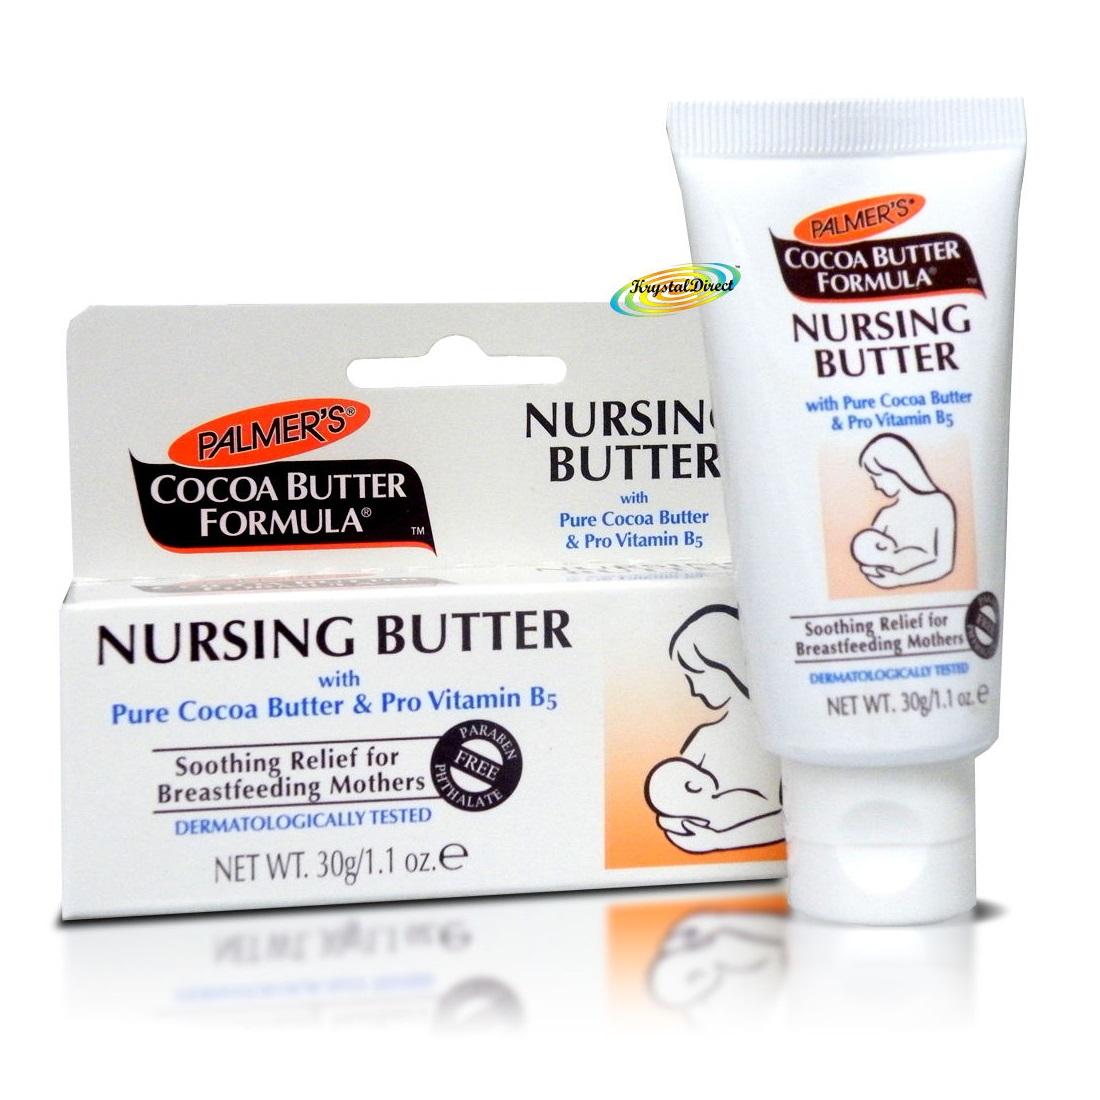 palmer's nursing butter